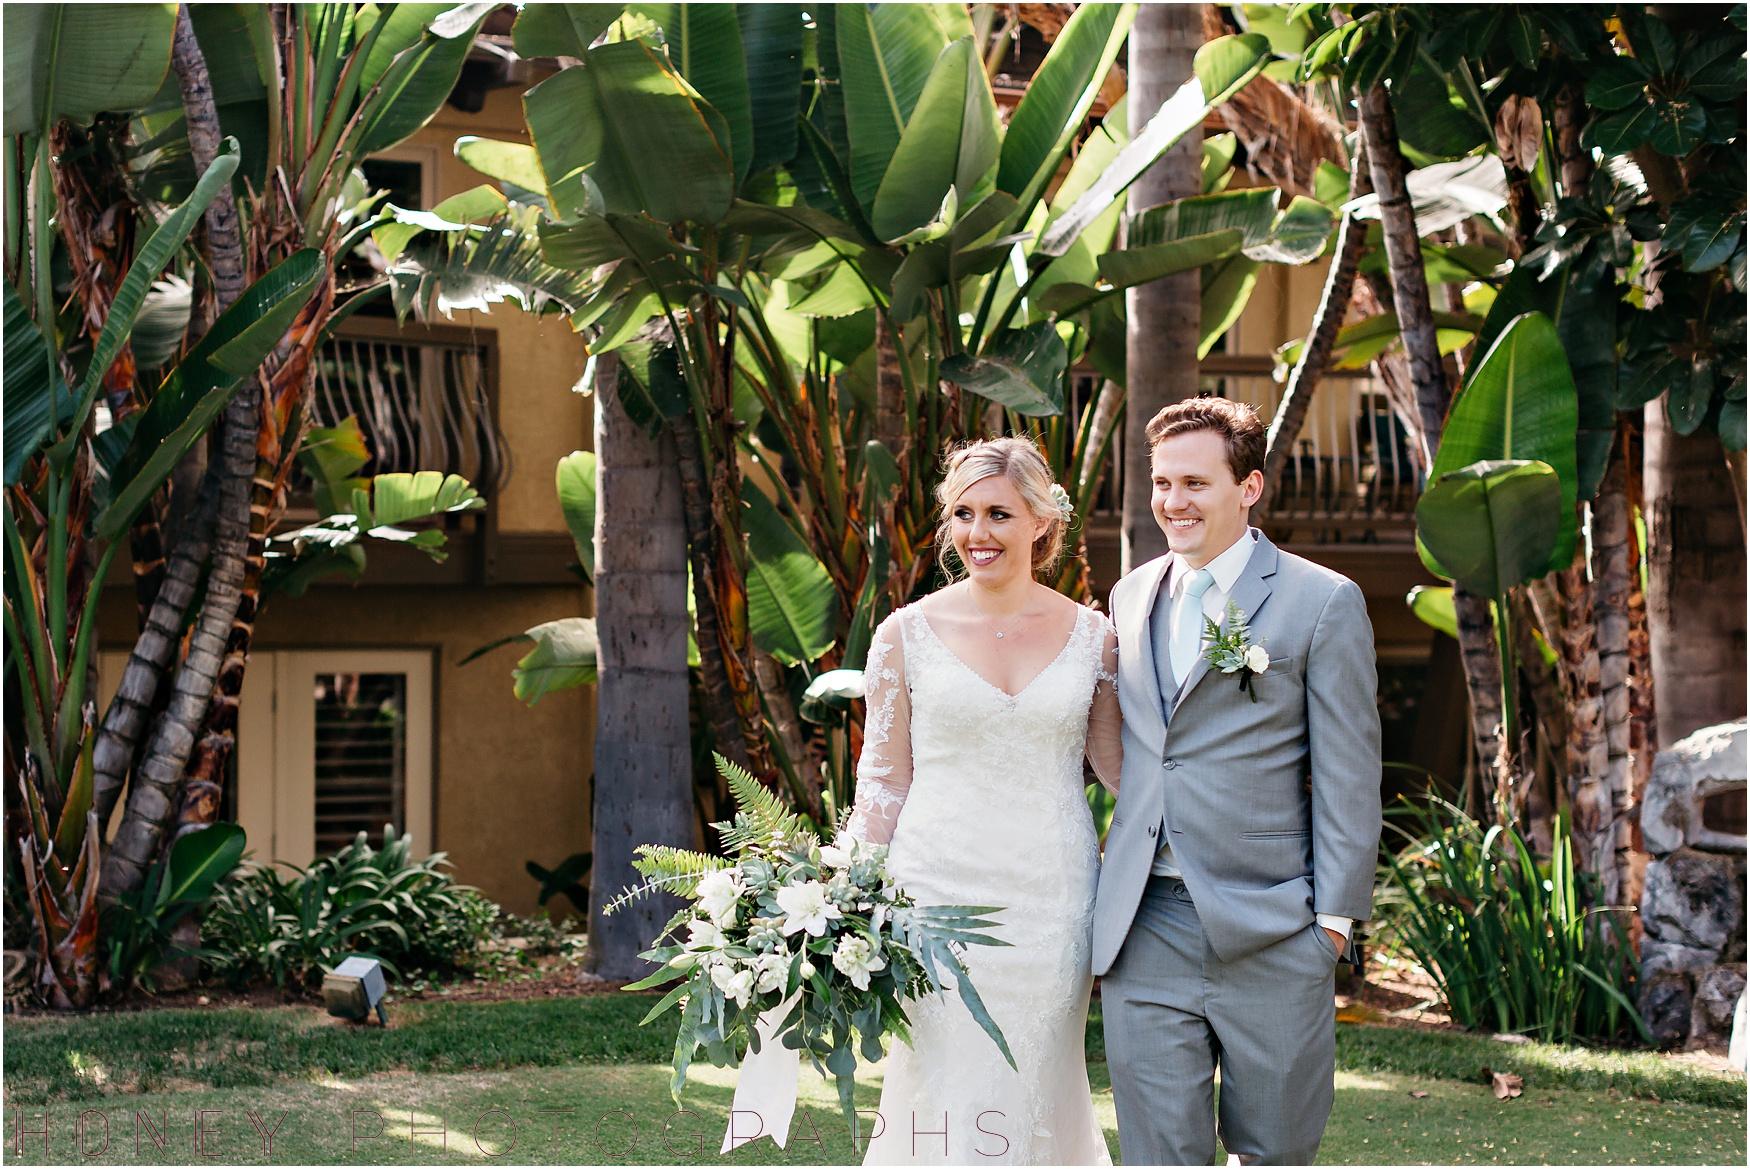 oceanview_point_loma_tropical_beach_ocean_wedding017.jpg